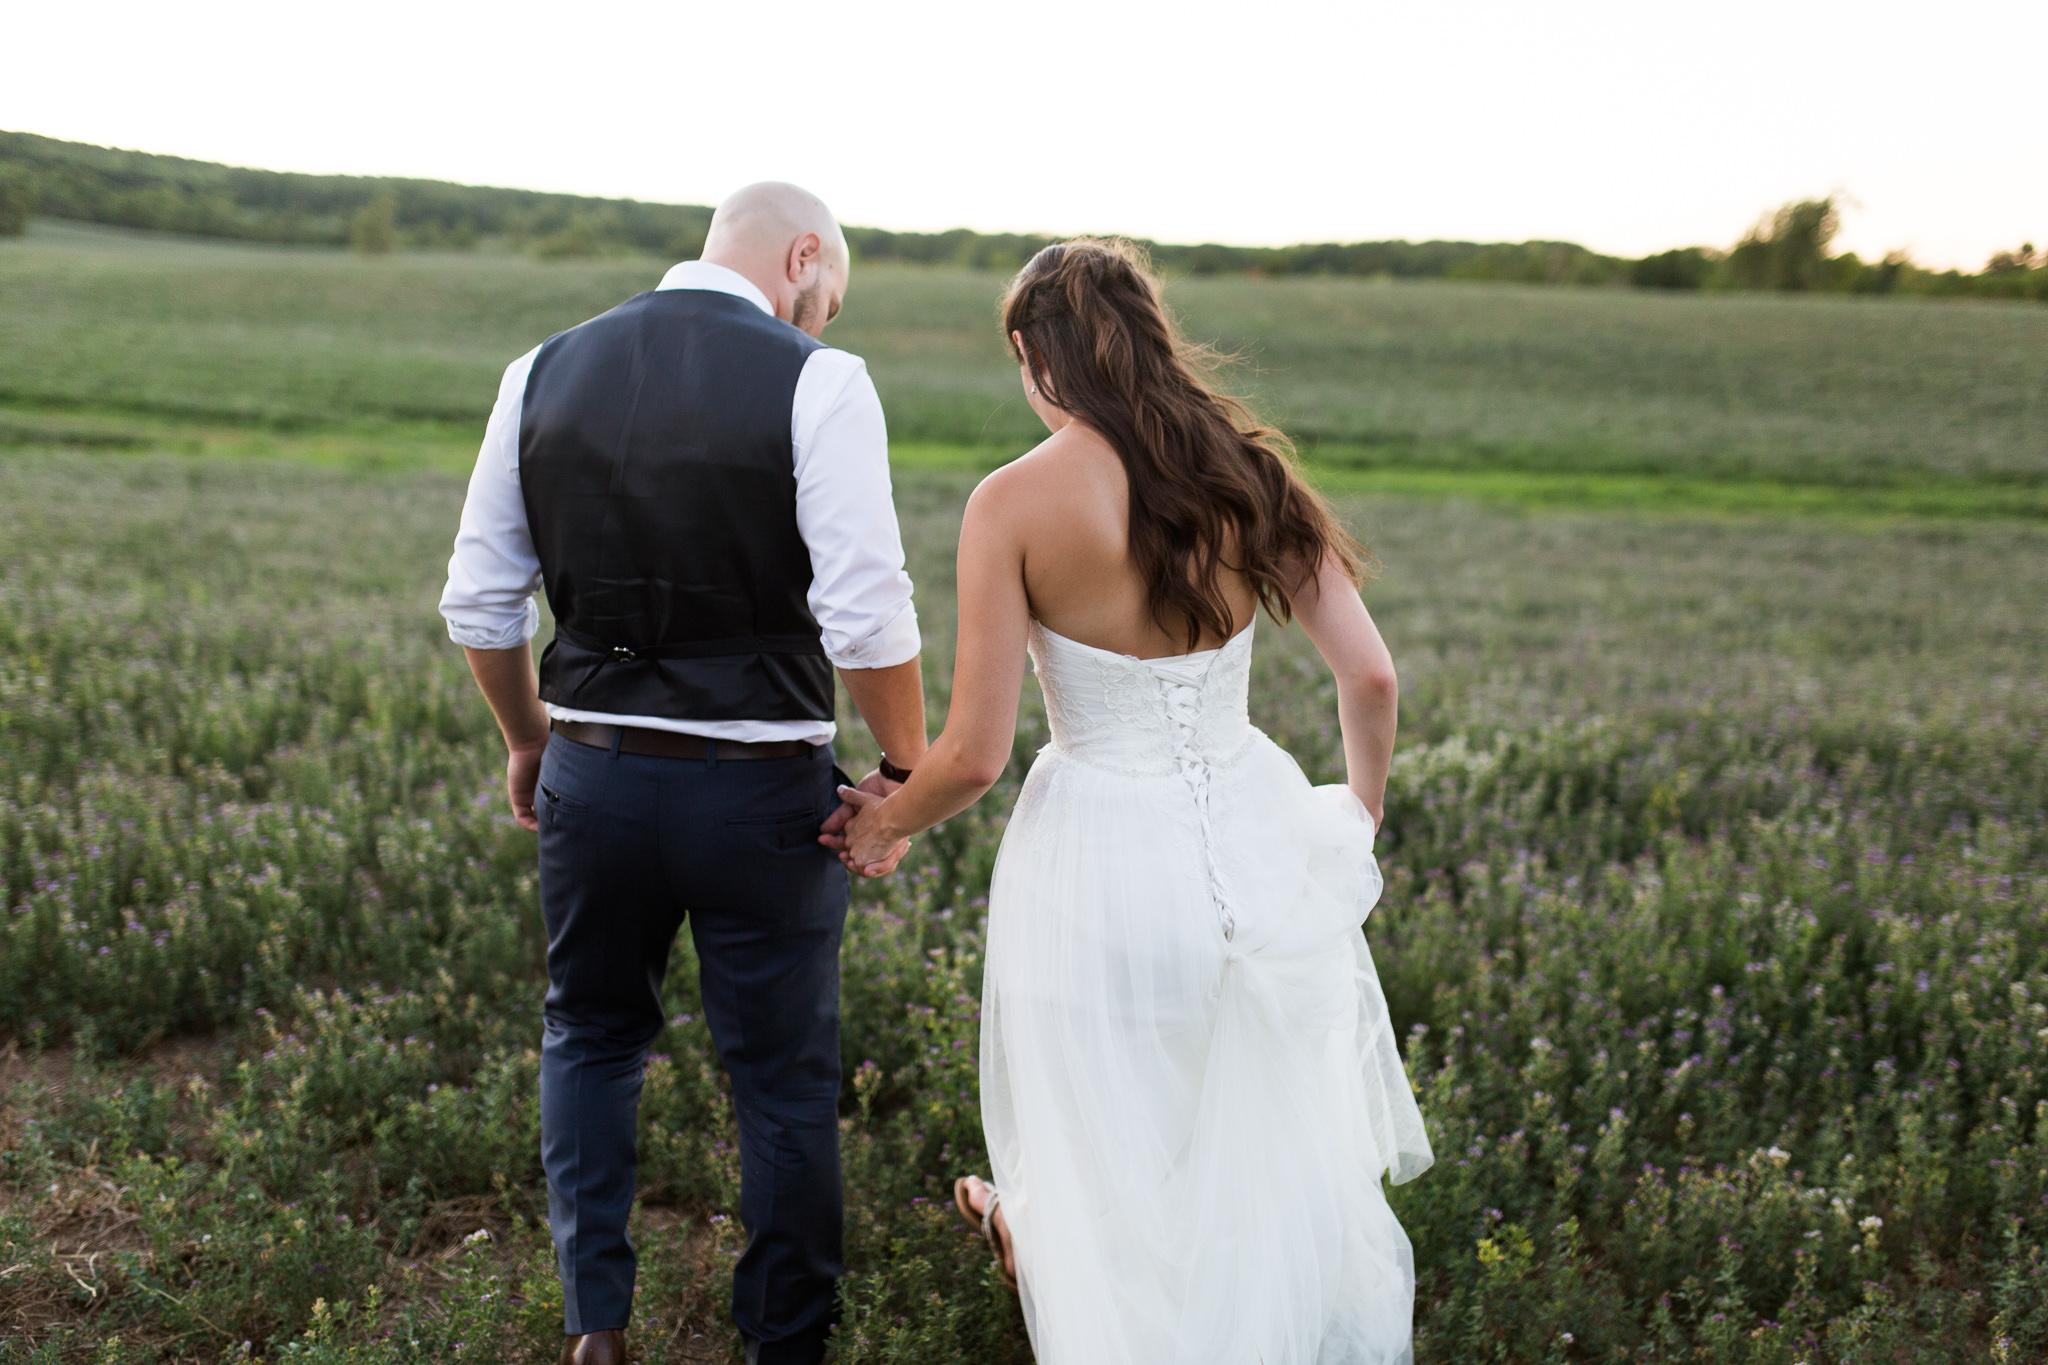 springer-house-burlington-wedding-photographer-618-of-756.jpg